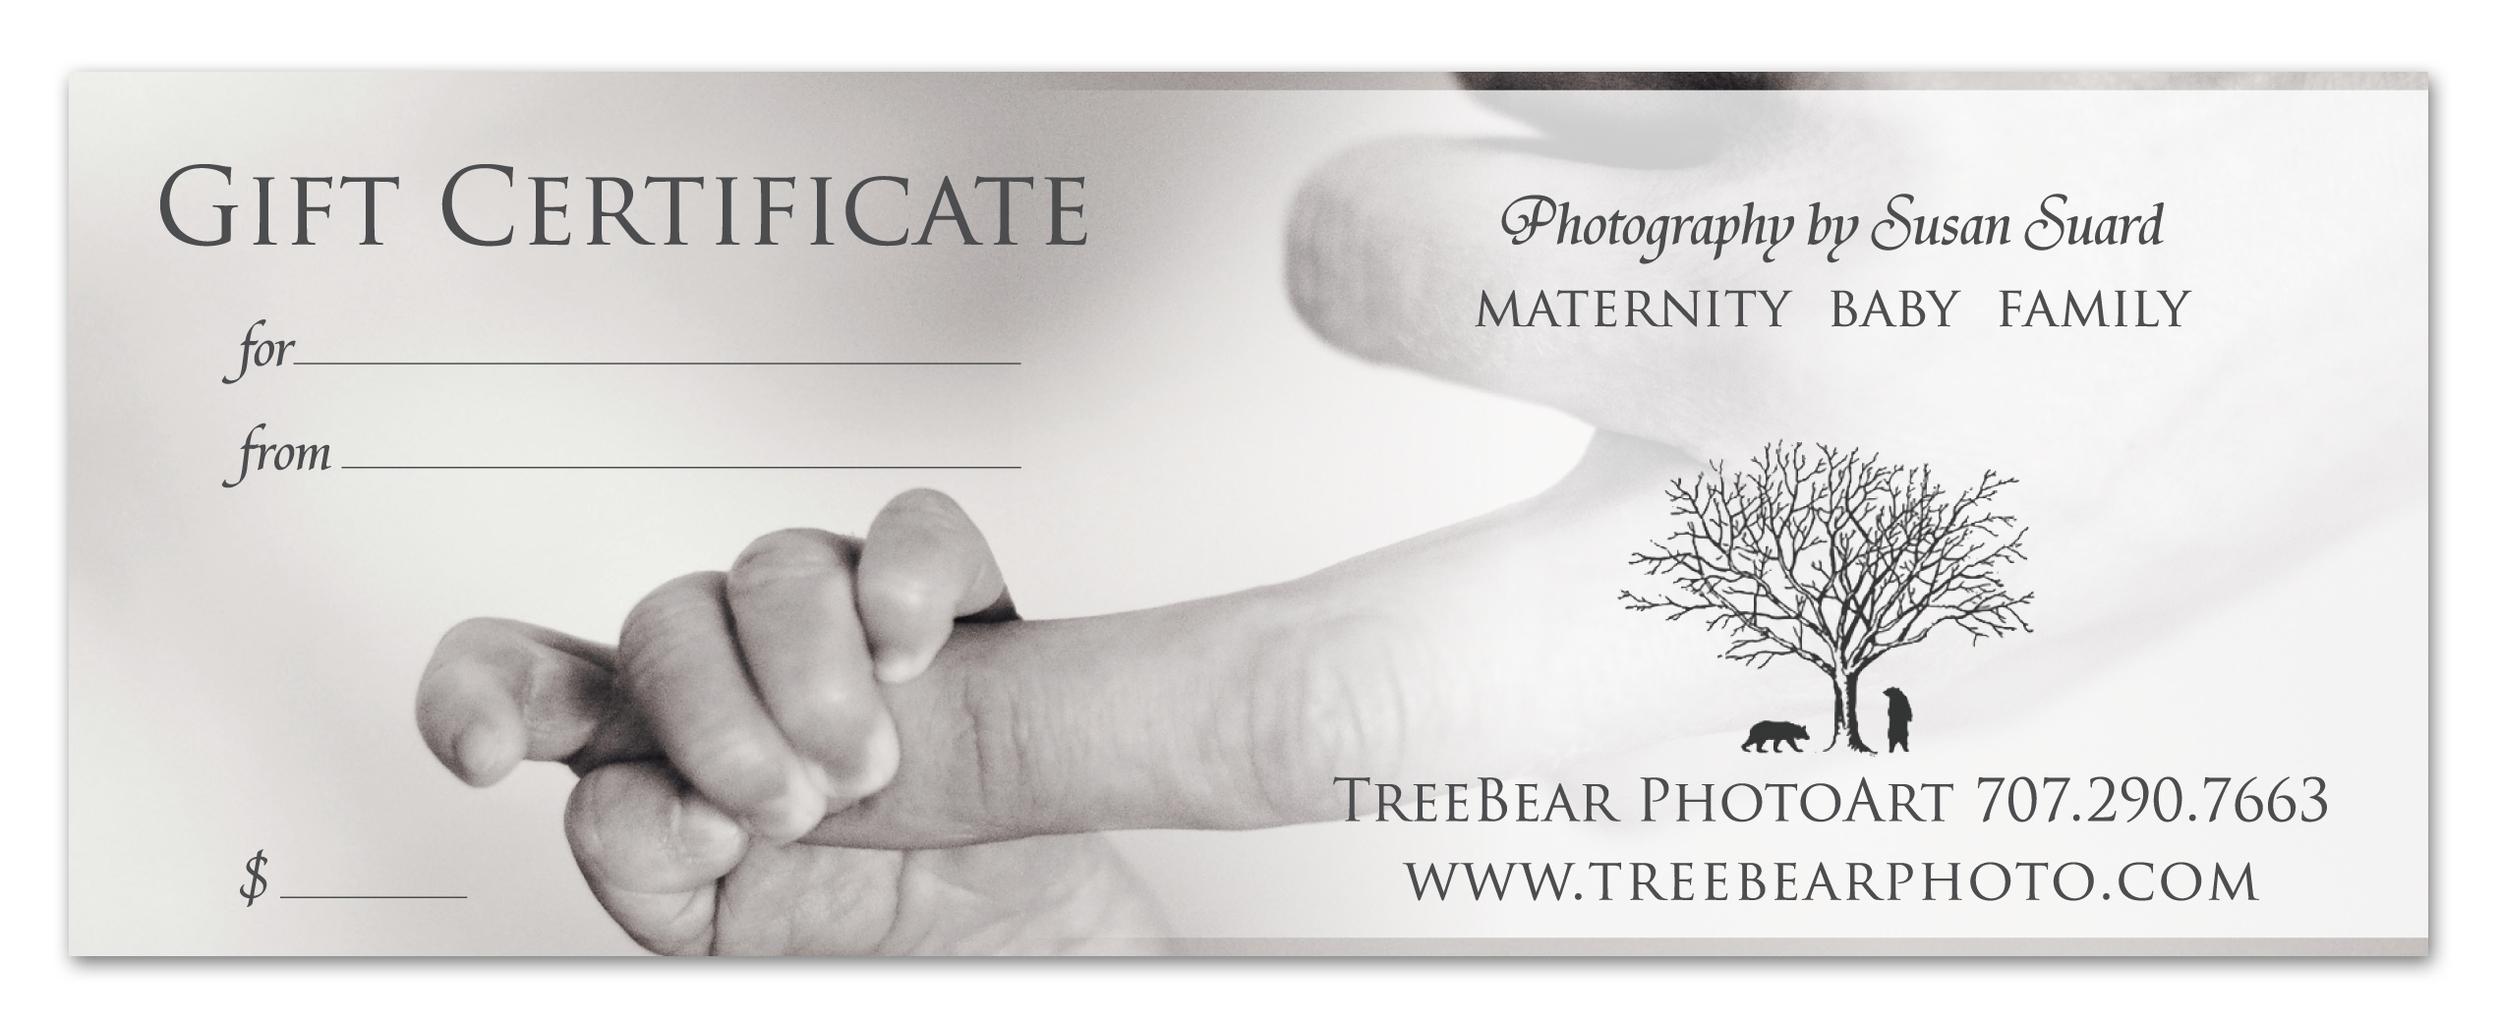 Gift Certificate | Design